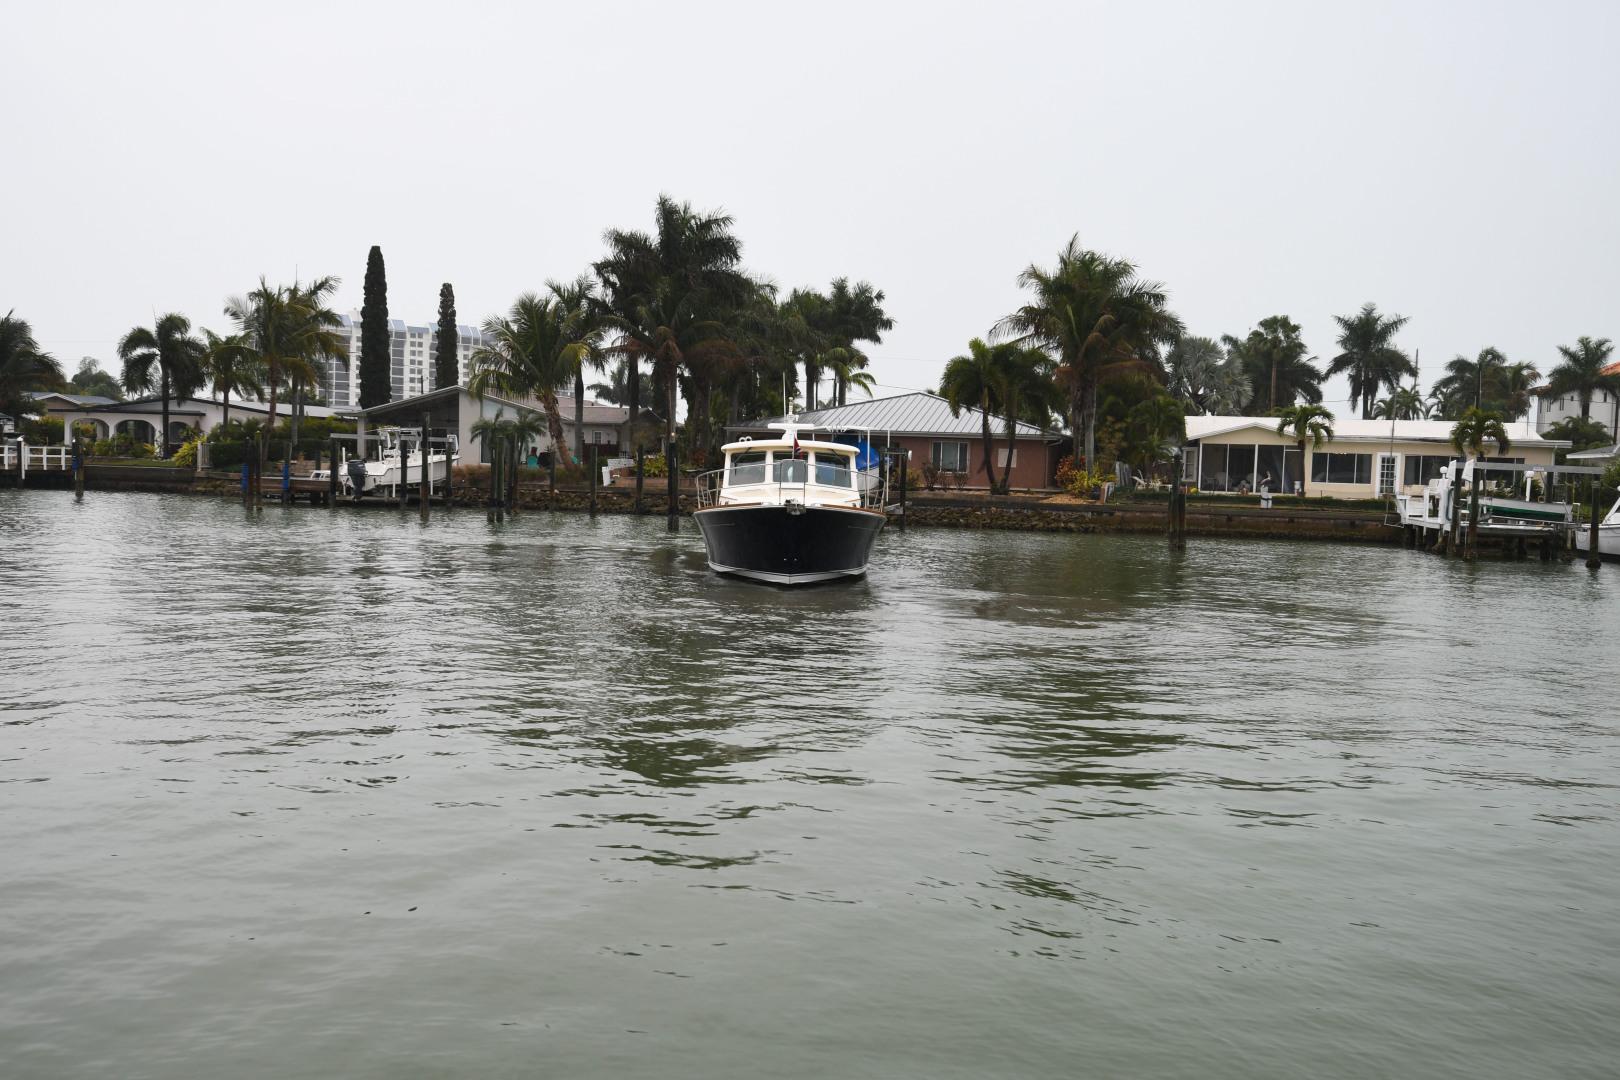 Sabre-40 Express 2010-Impulse Treasure Island-Florida-United States-2010 40 Sabre Express  Impulse  Bow Profile-1618658 | Thumbnail